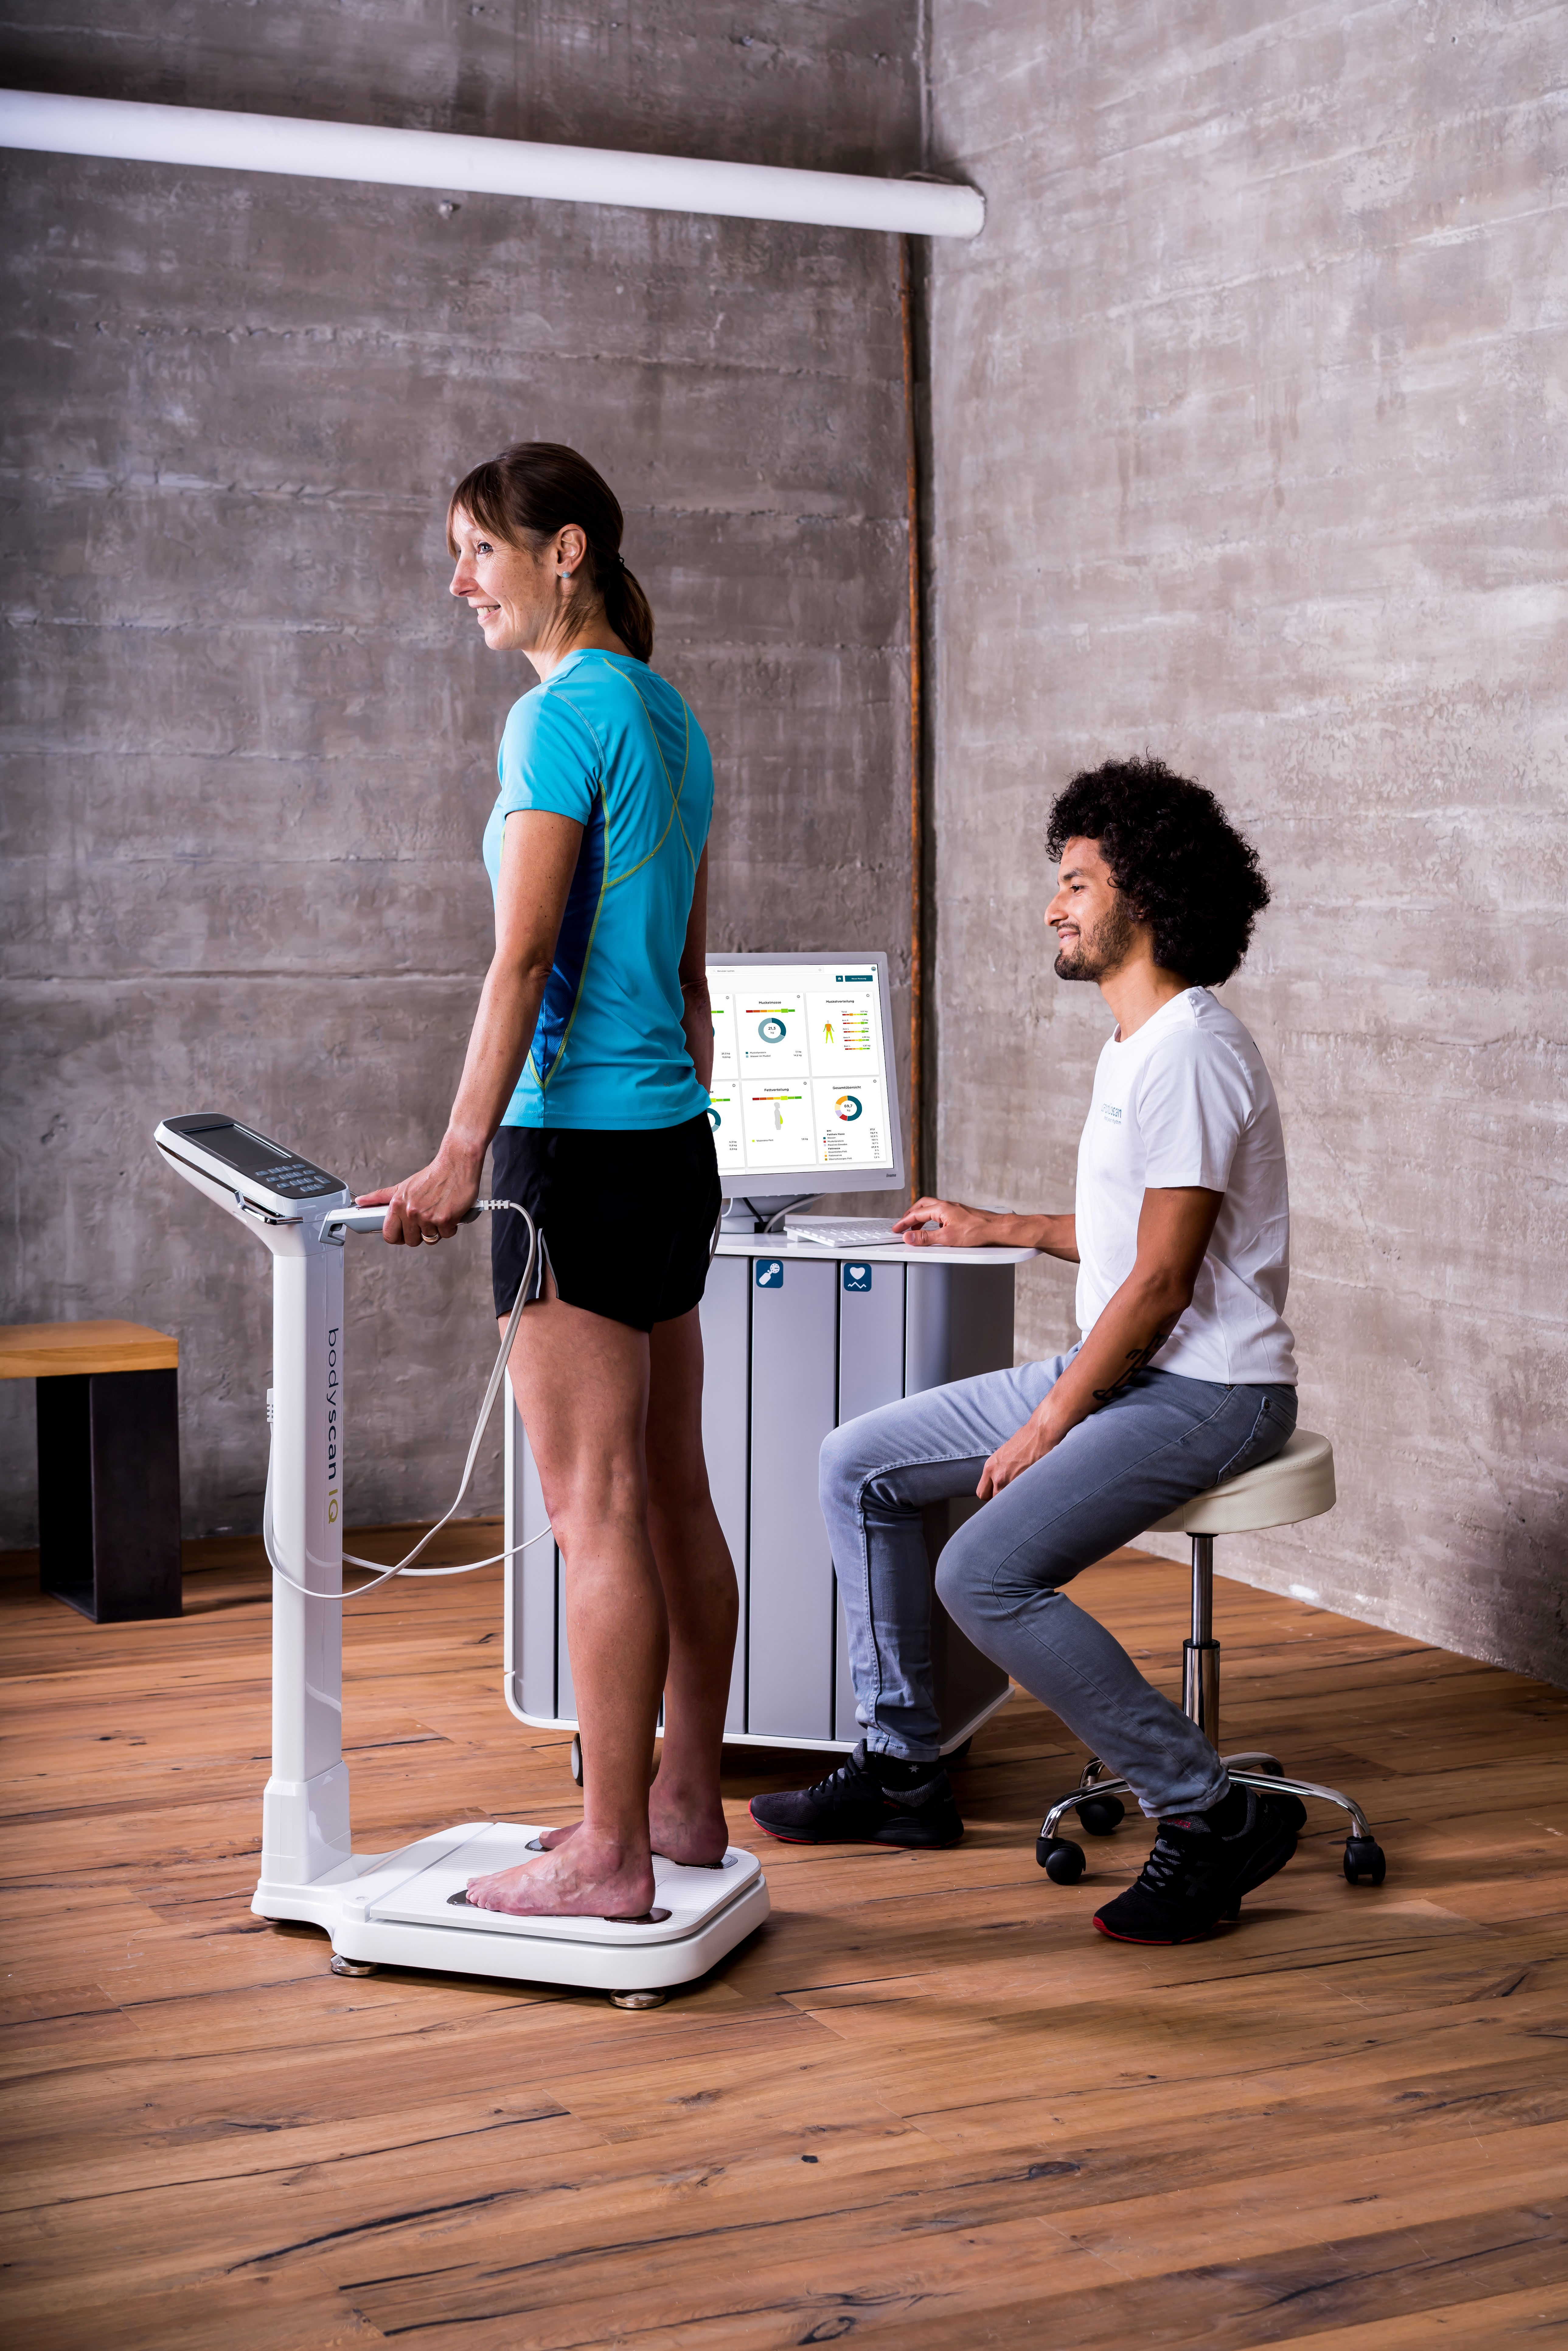 checkpoint - smarte Diagnostik, damit Training funktioniert